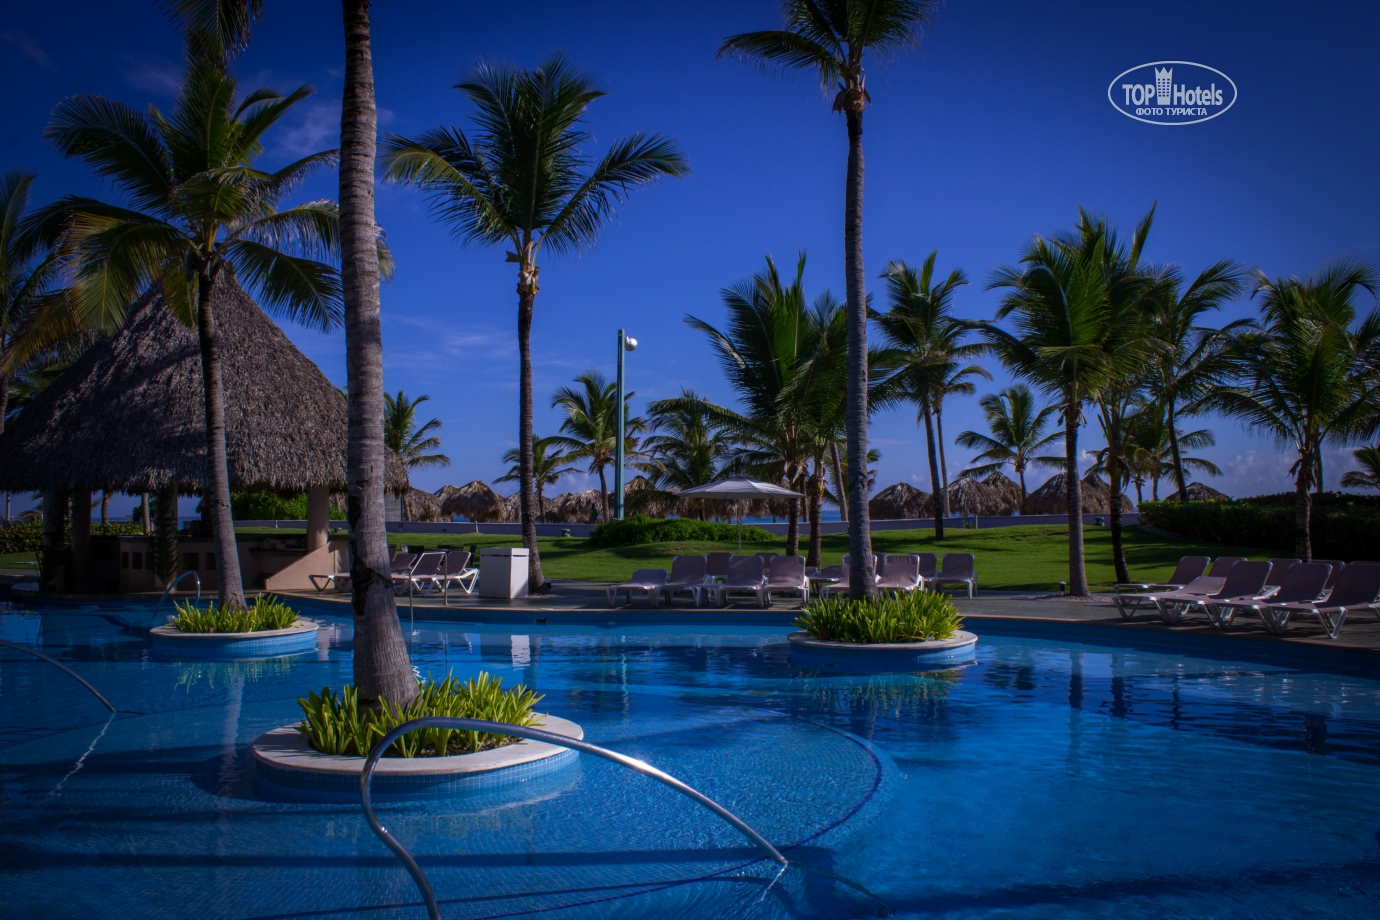 Доминикана отель хард рок фото